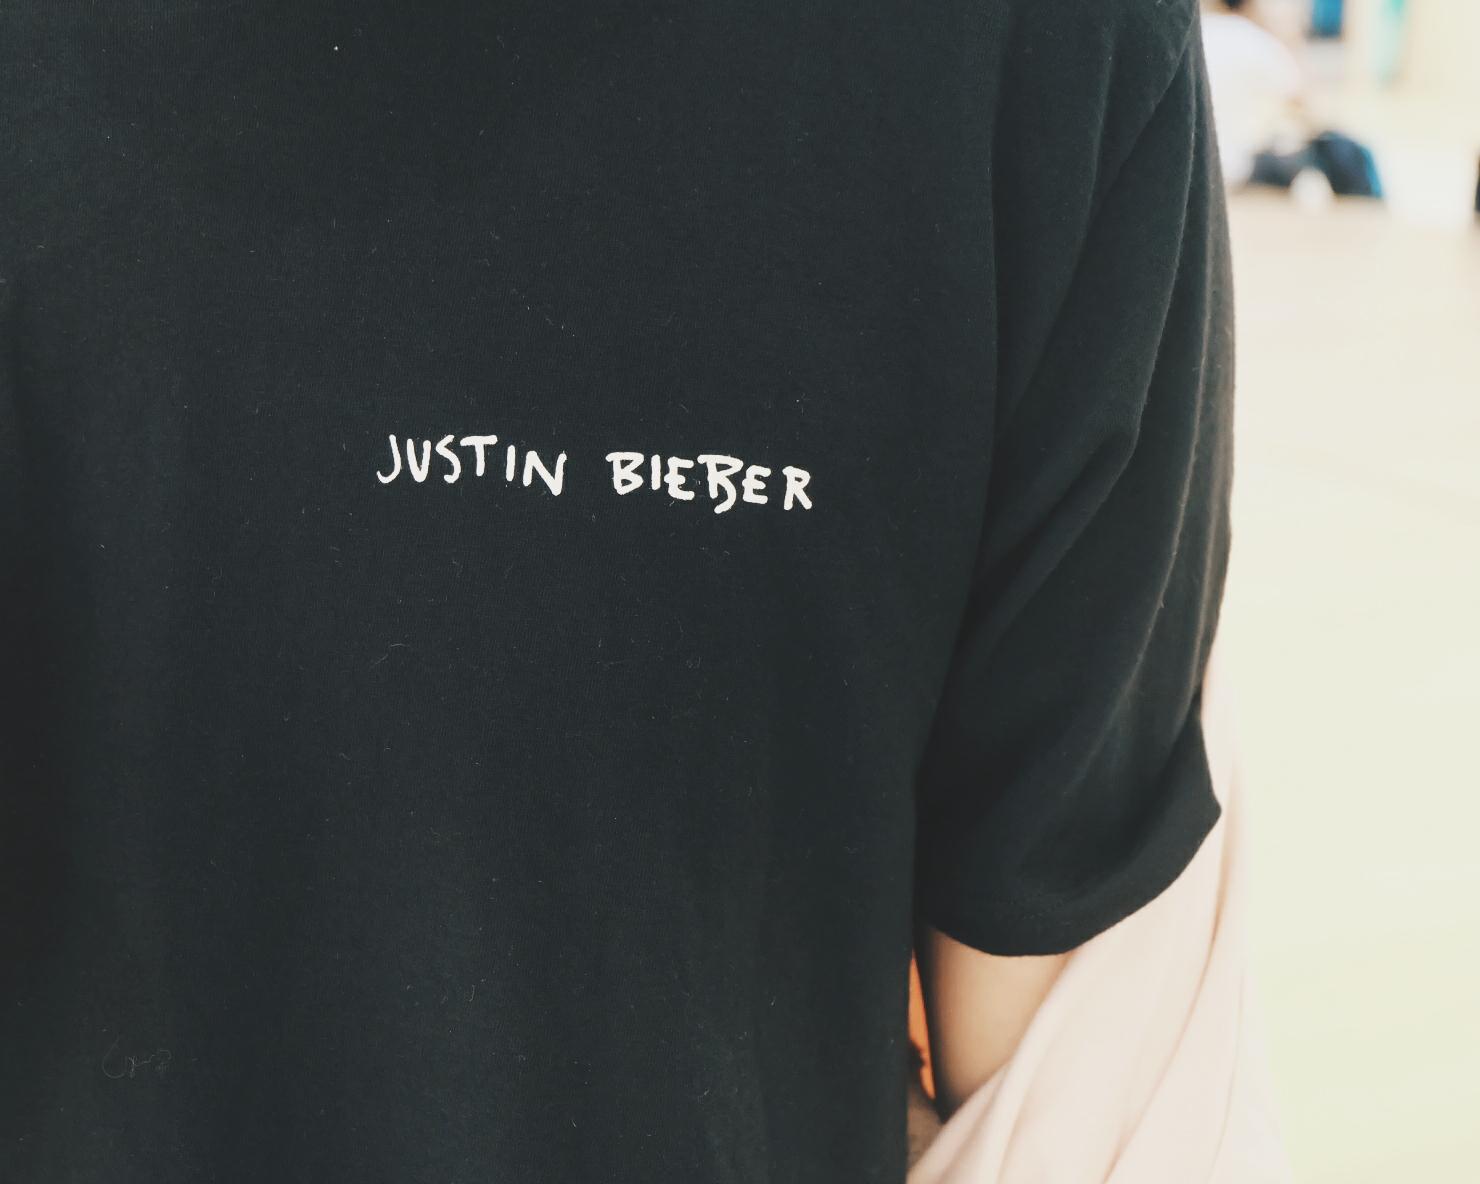 Oxygen x Justin Bieber Streetwear Collection #OxygenxBieber